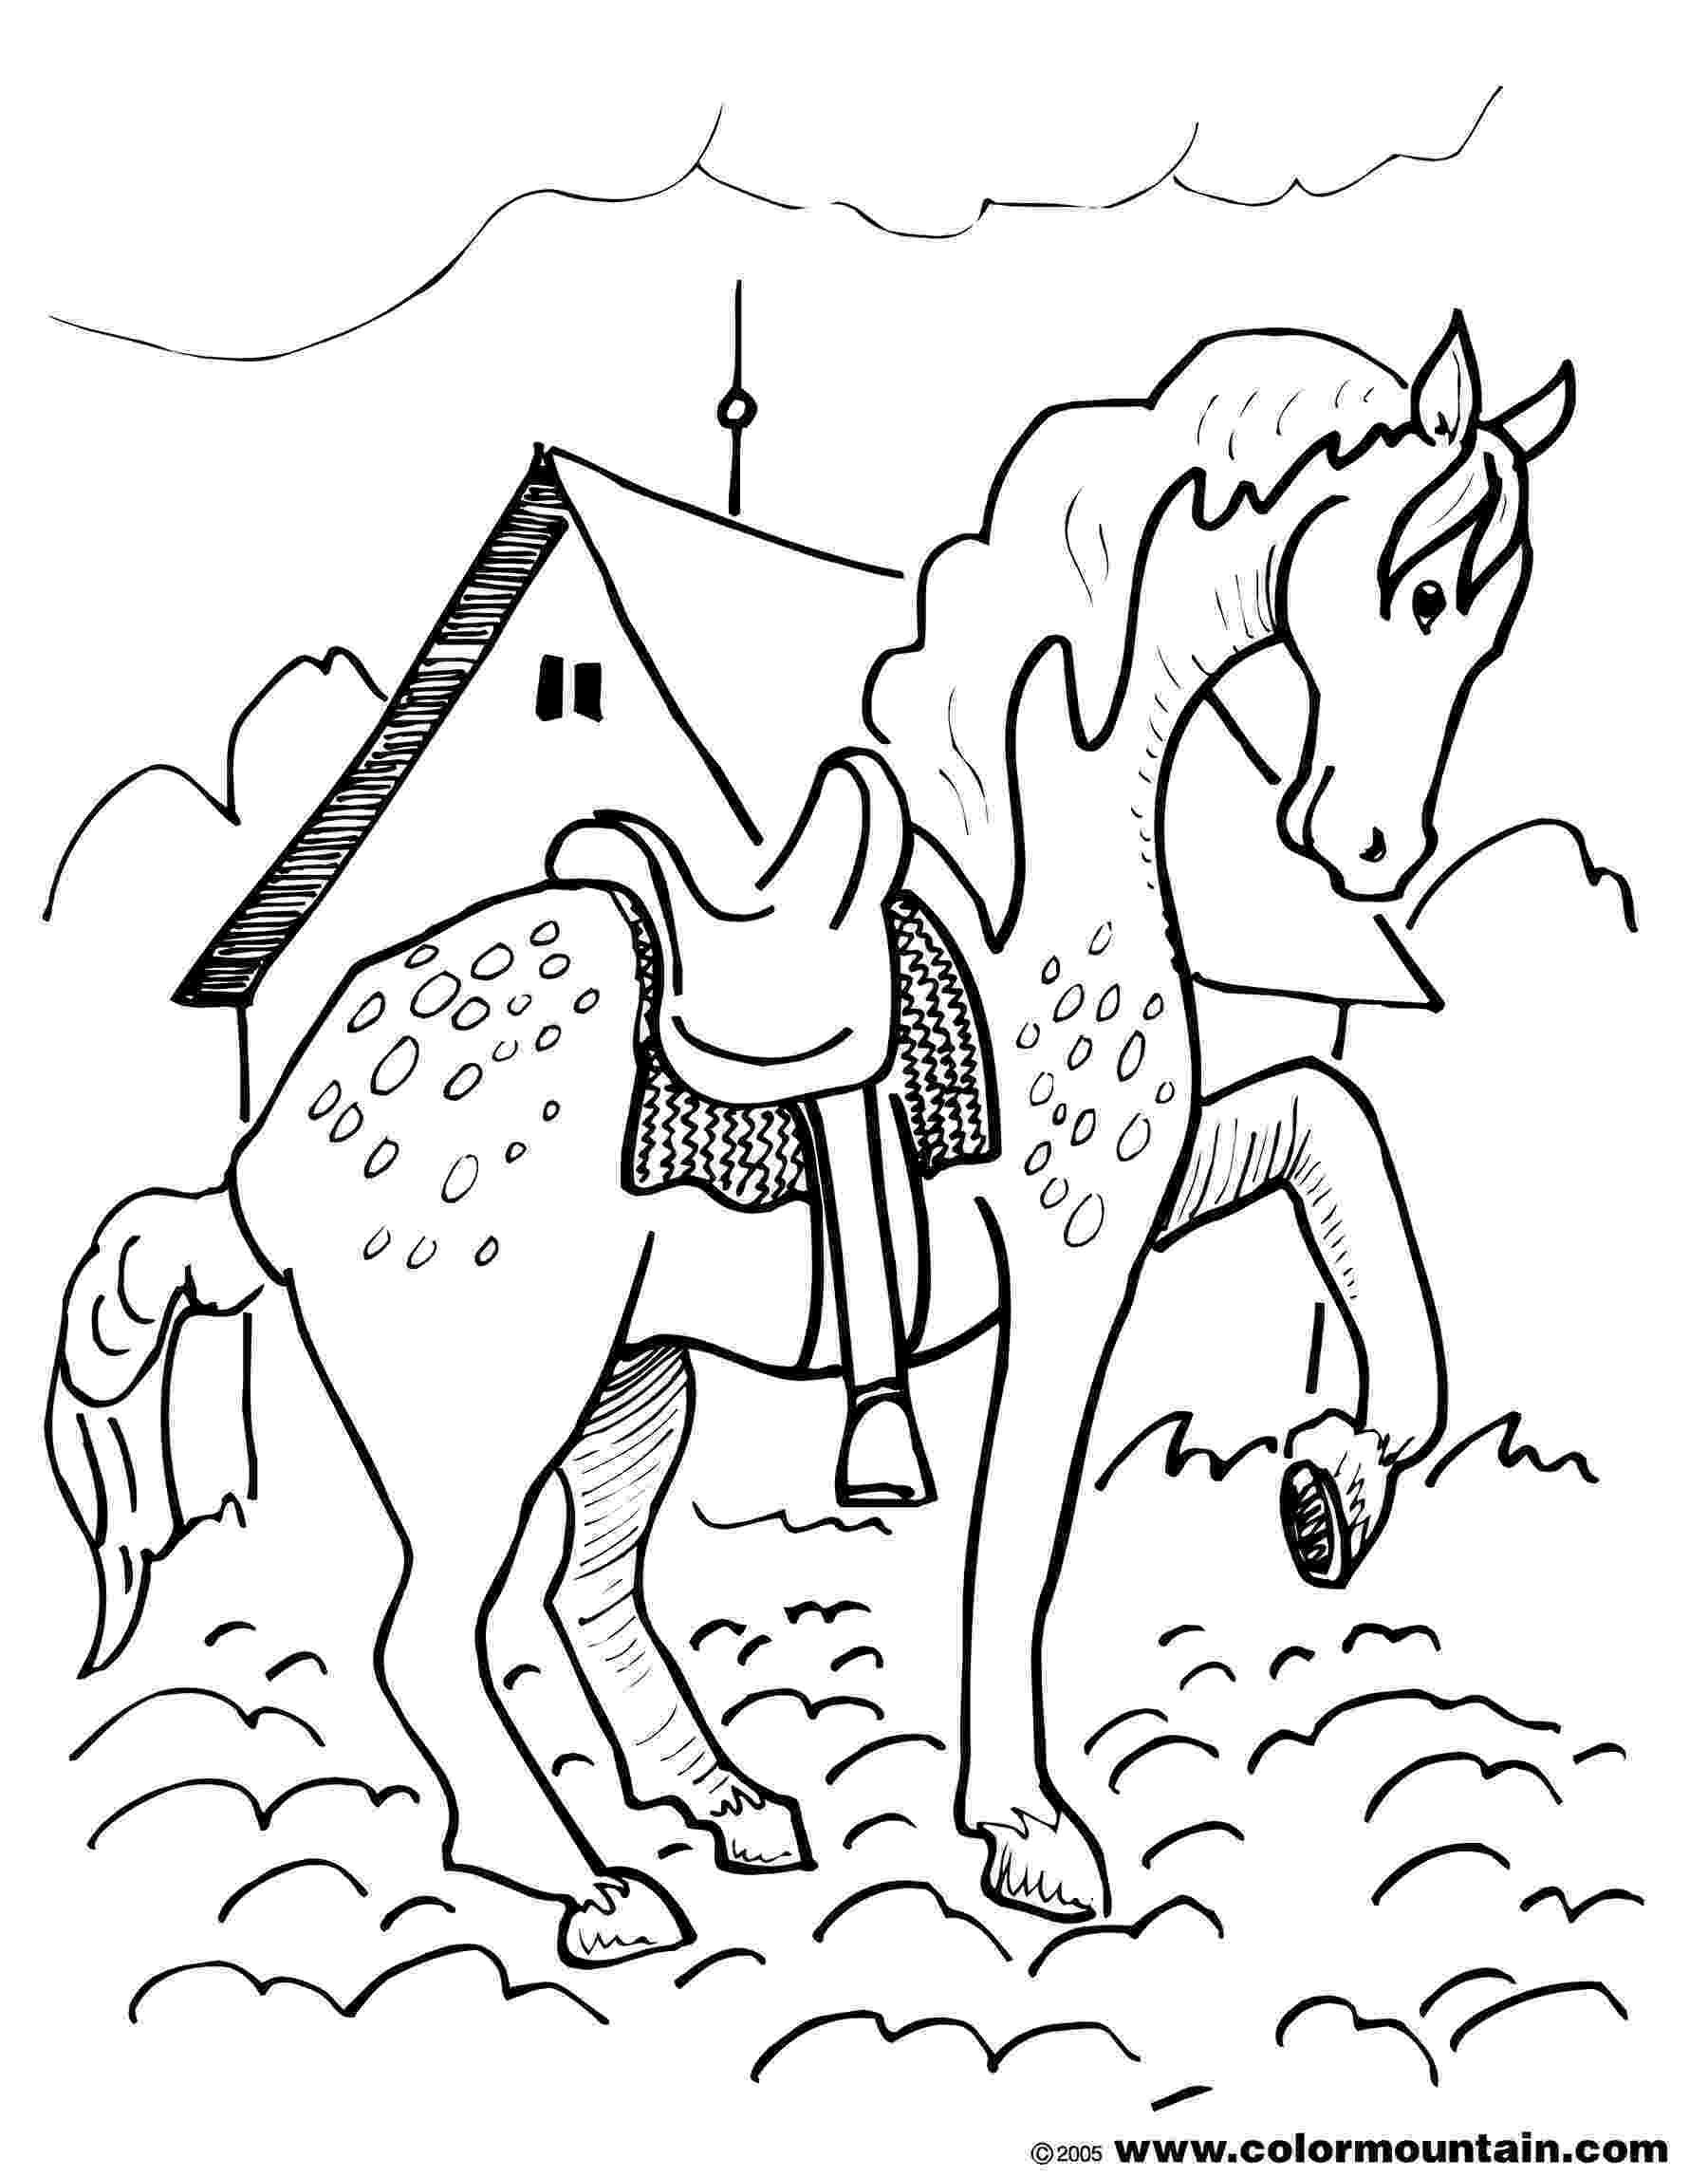 horse print out out horse print out horse print